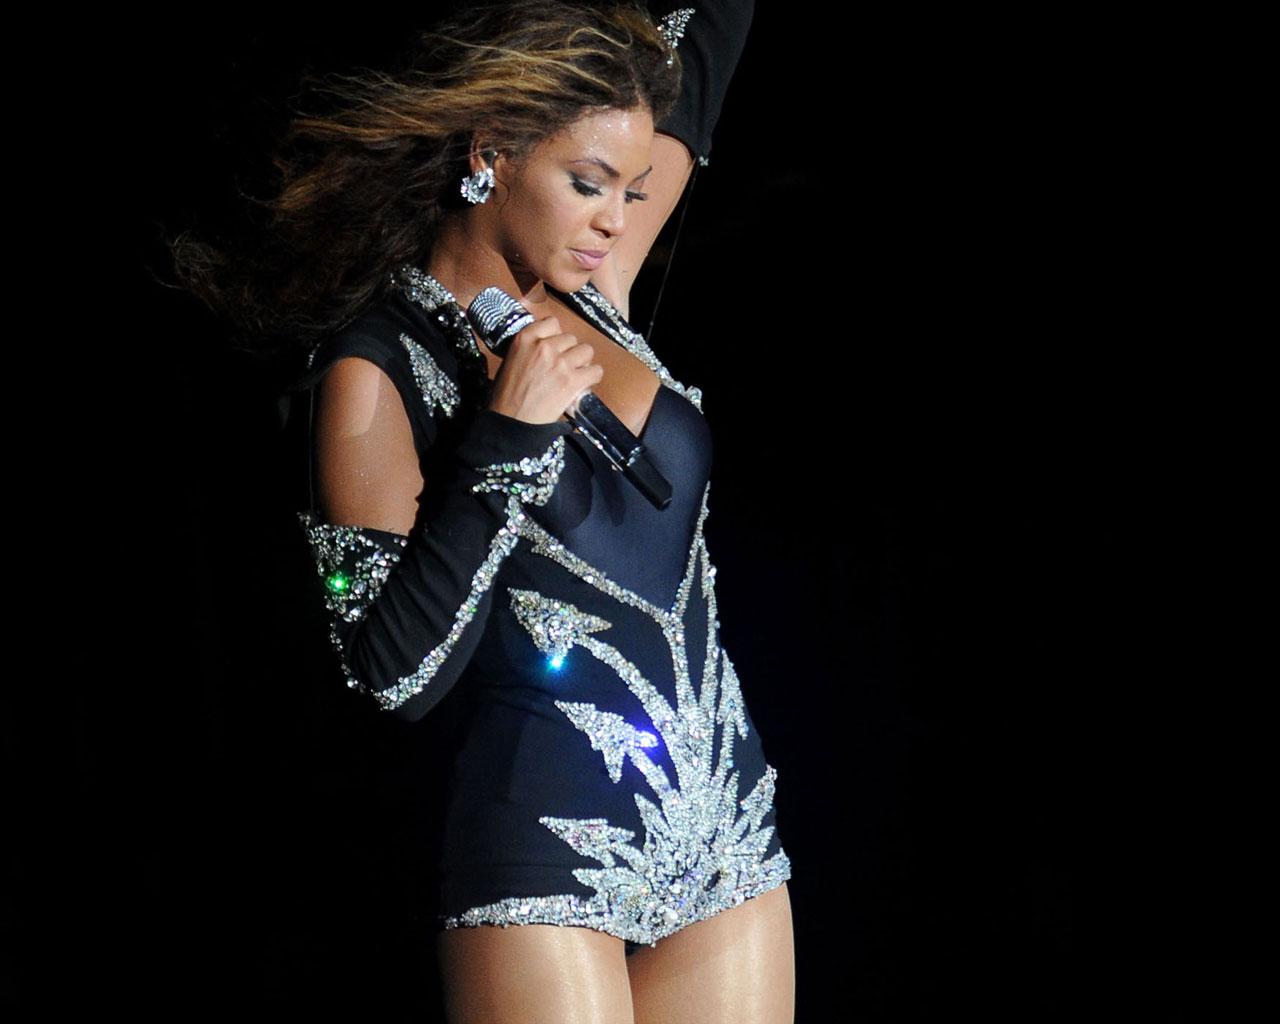 http://2.bp.blogspot.com/-80j6KY9o8iM/TnRE_Zwg2uI/AAAAAAAABMY/X-t8cTbAPpo/s1600/Beyonce_Knowles_Actress_Free_Download_High_Resolution_HD_HQ_Desktop_Backgrounds_Face_Wallpapers_21023.jpg